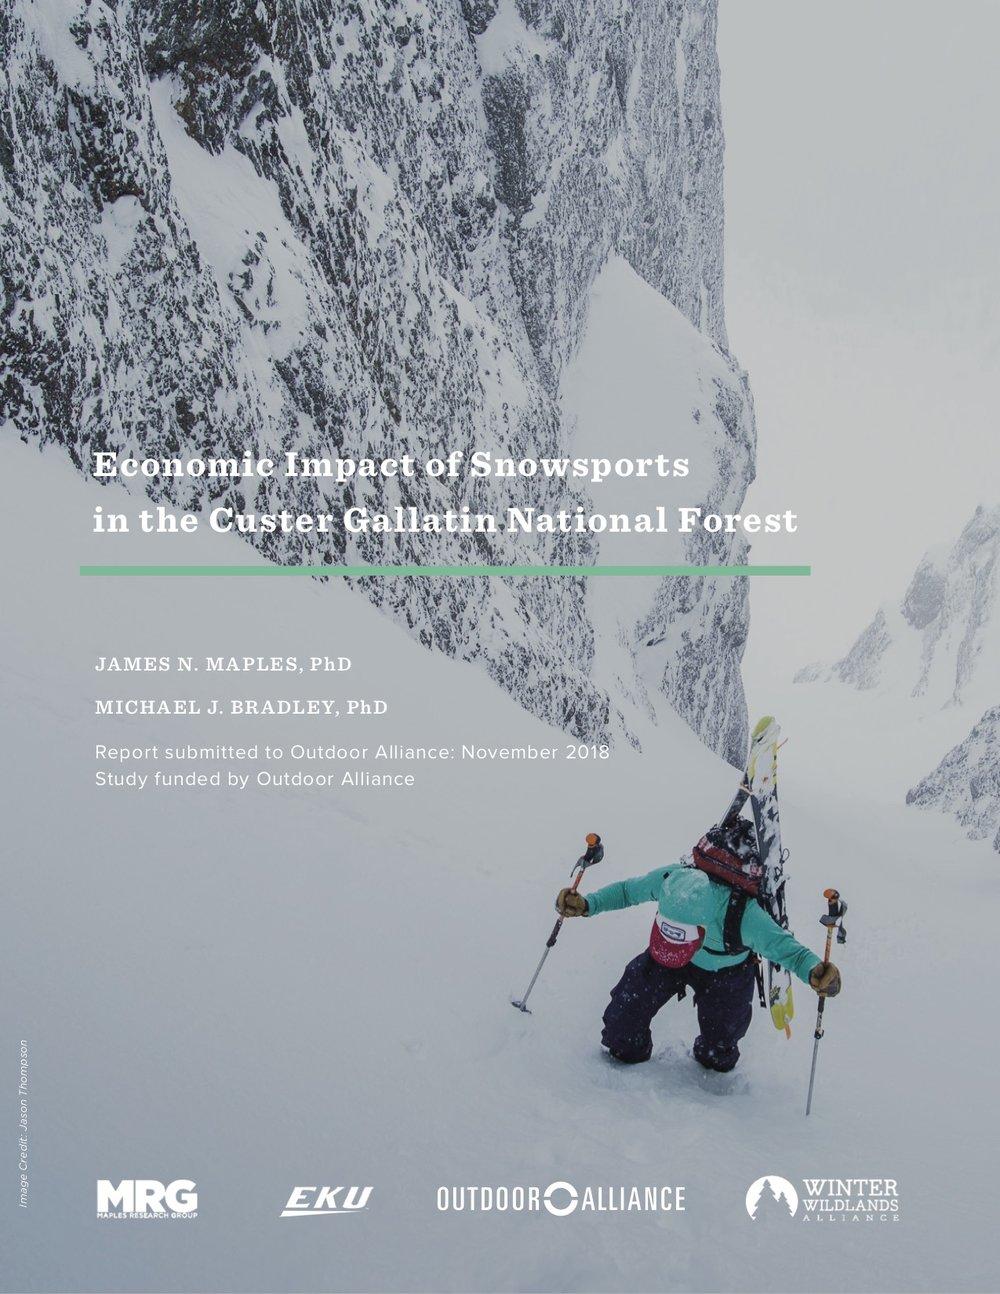 OA_CusterGallatinNF_SnowsportsStudy2018 copy.jpg